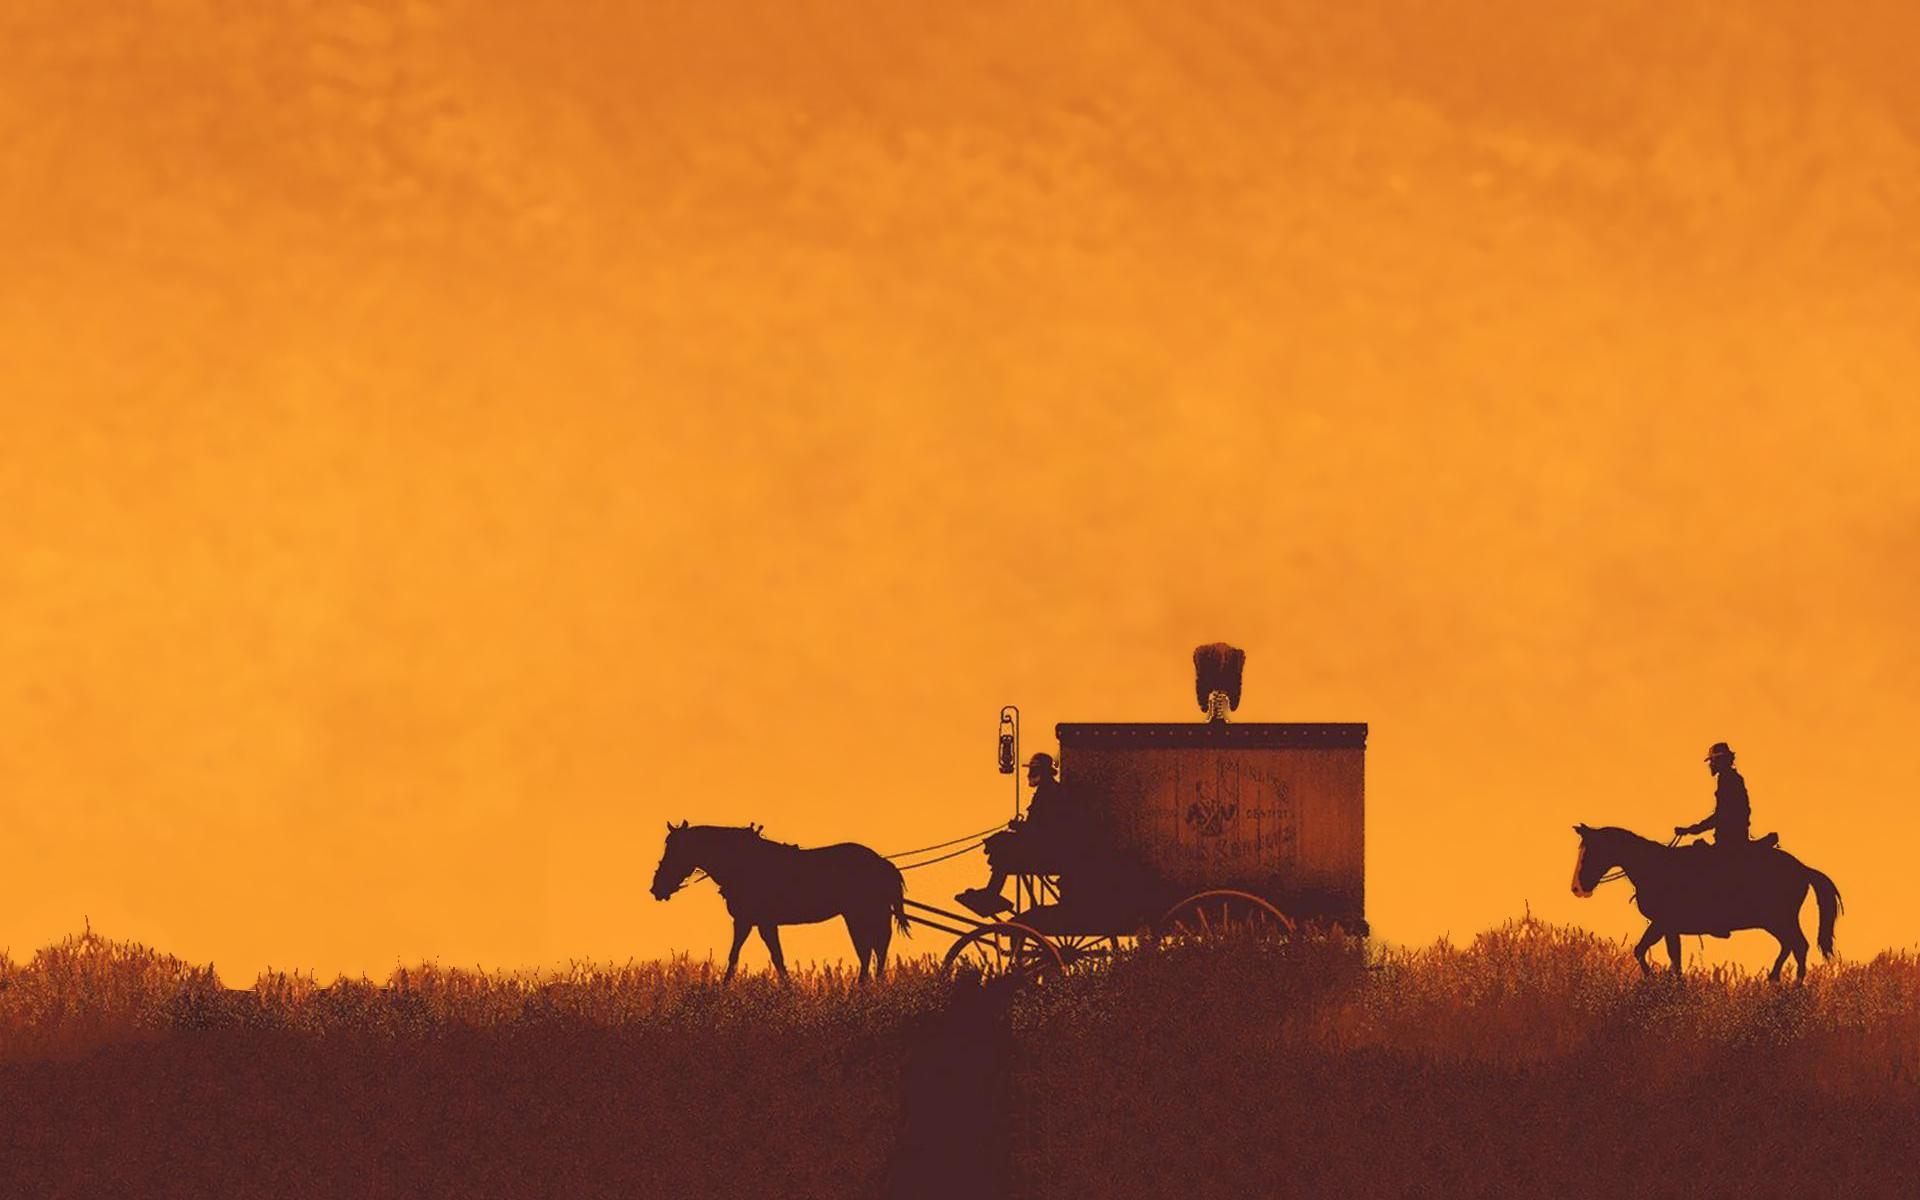 Django western artwork